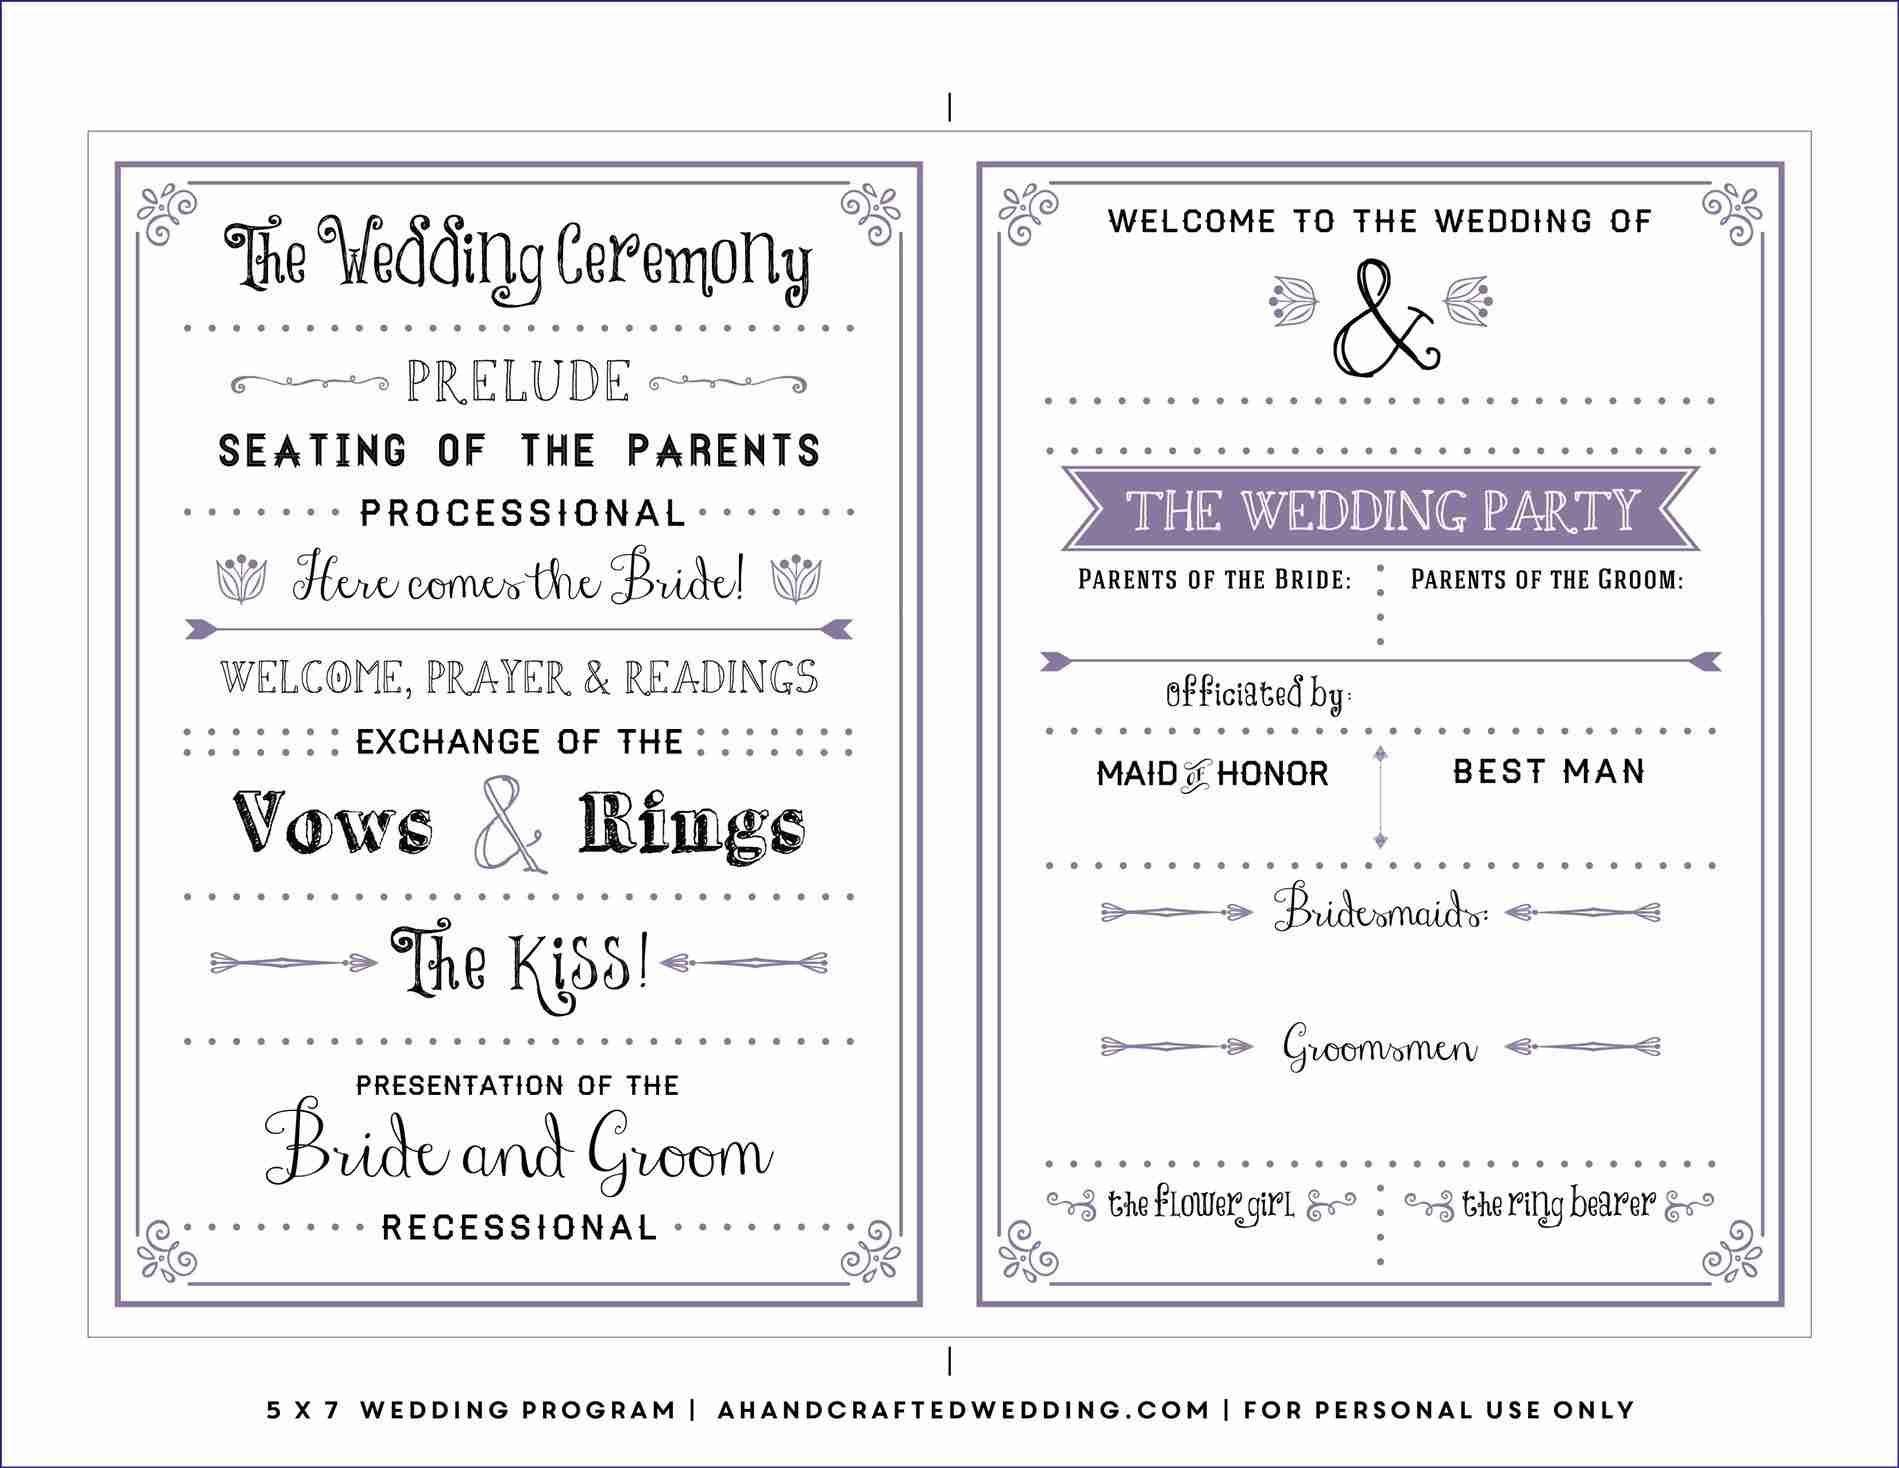 Free Downloadable Wedding Program Template That Can Be Printed - Free Printable Wedding Program Templates